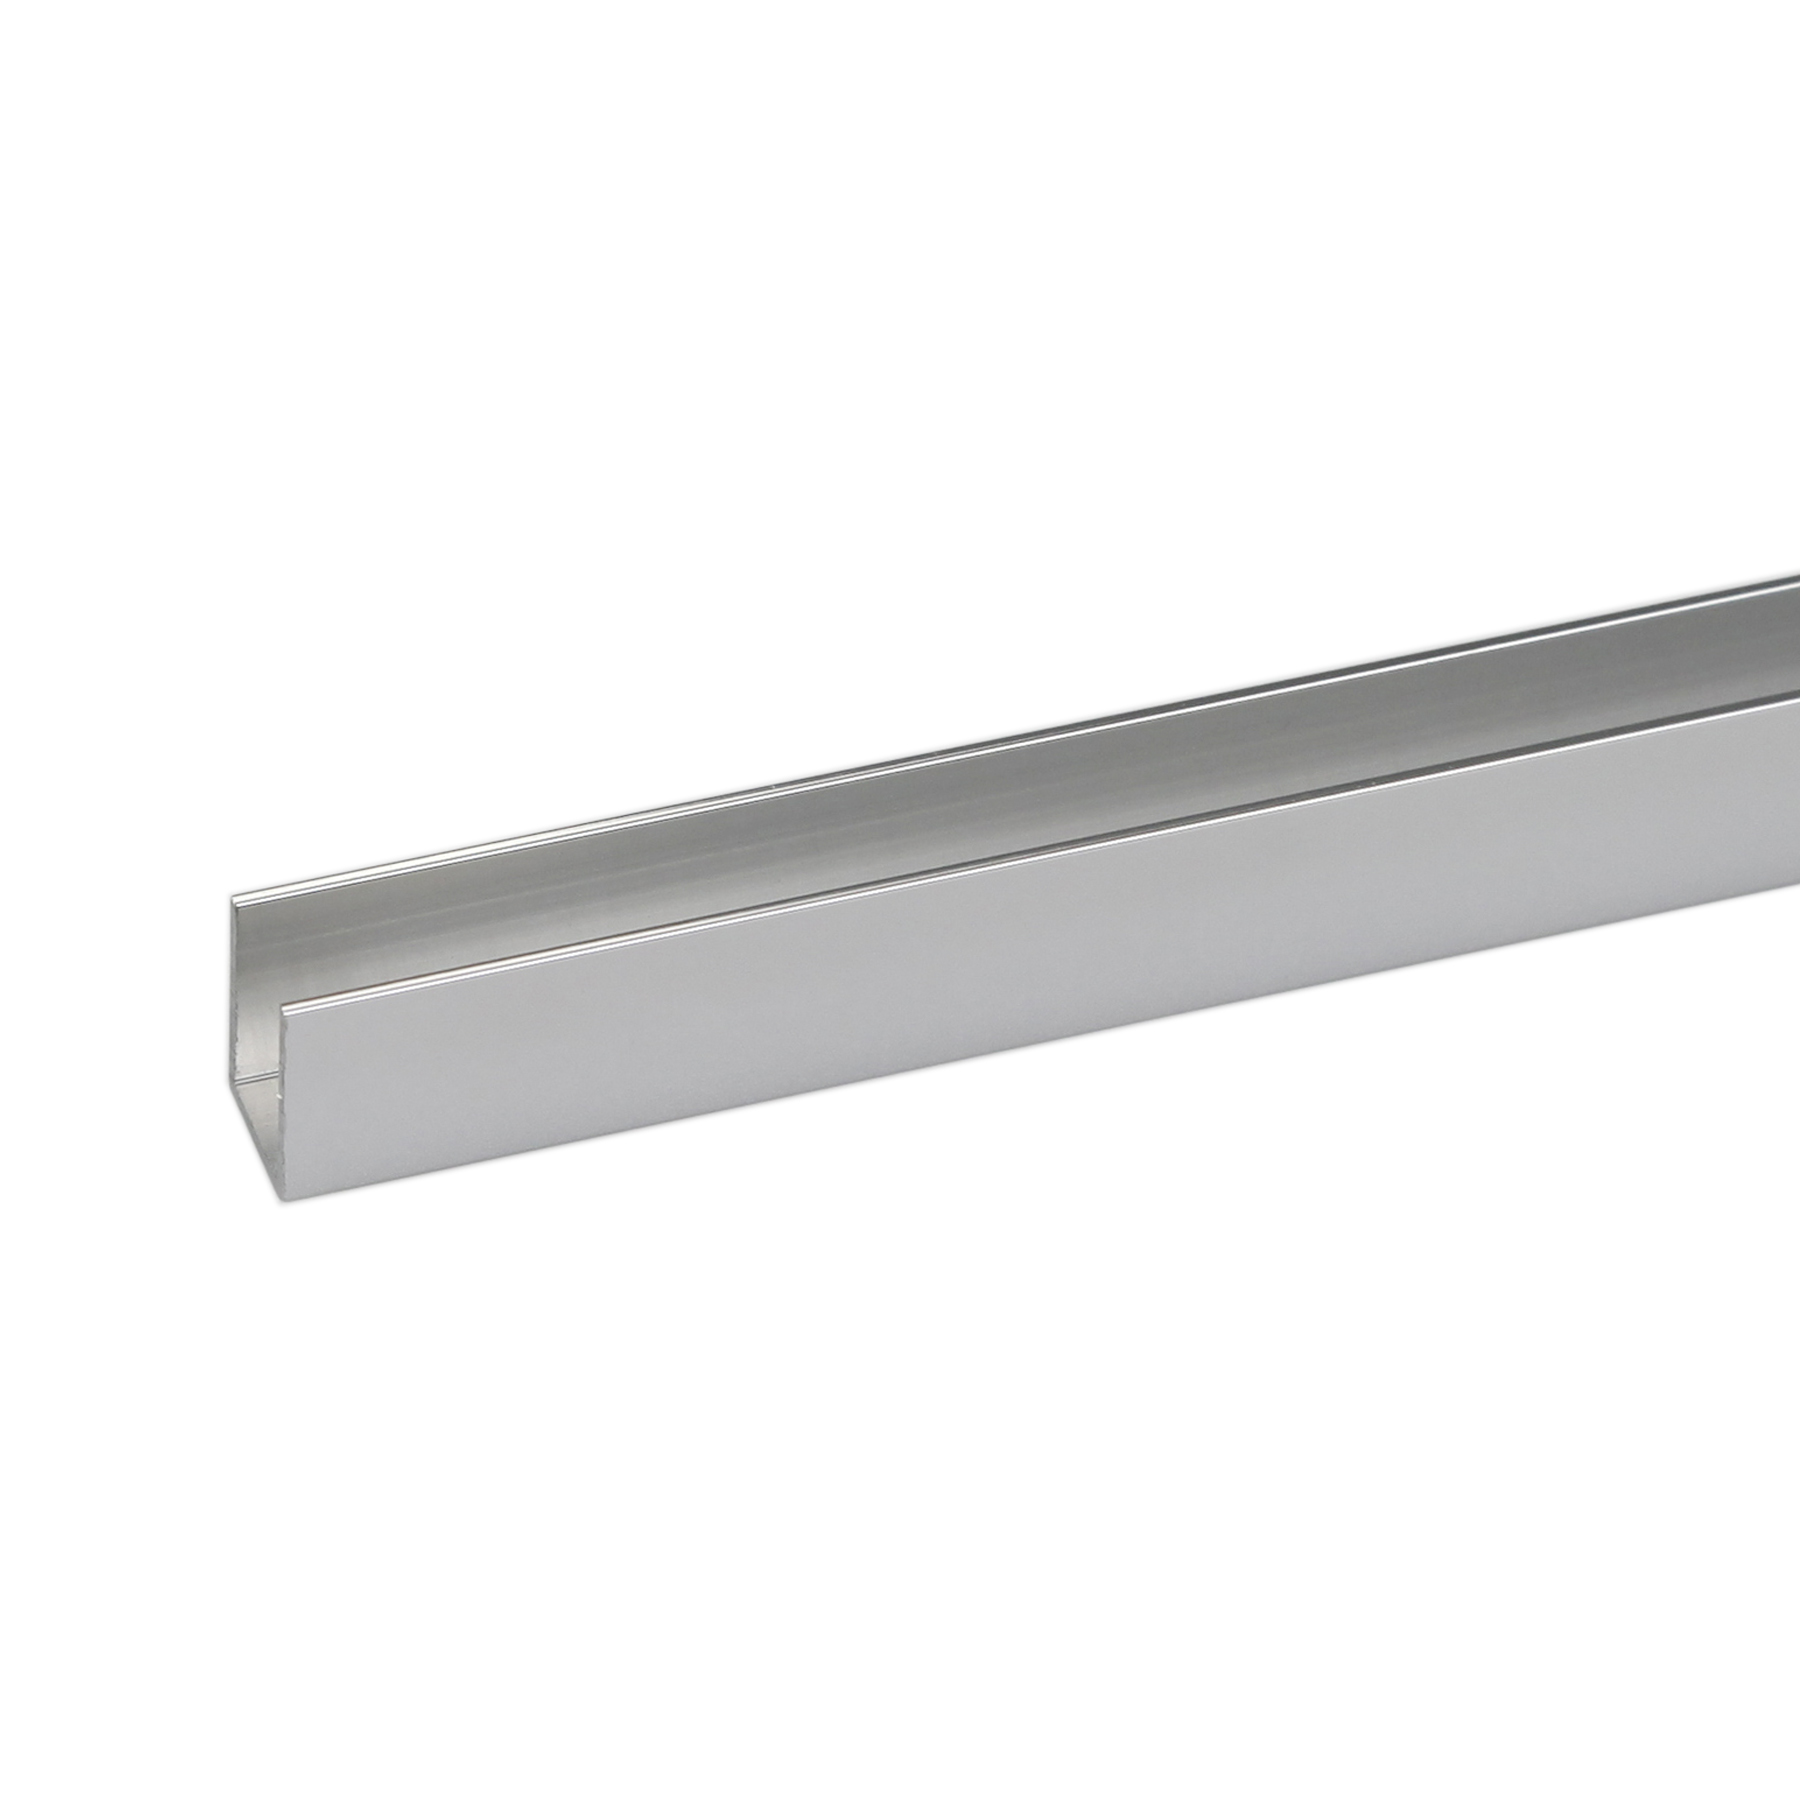 Perfil alum nio u 2mx10x10mm brilhante leroy merlin - Perfil de aluminio en u ...